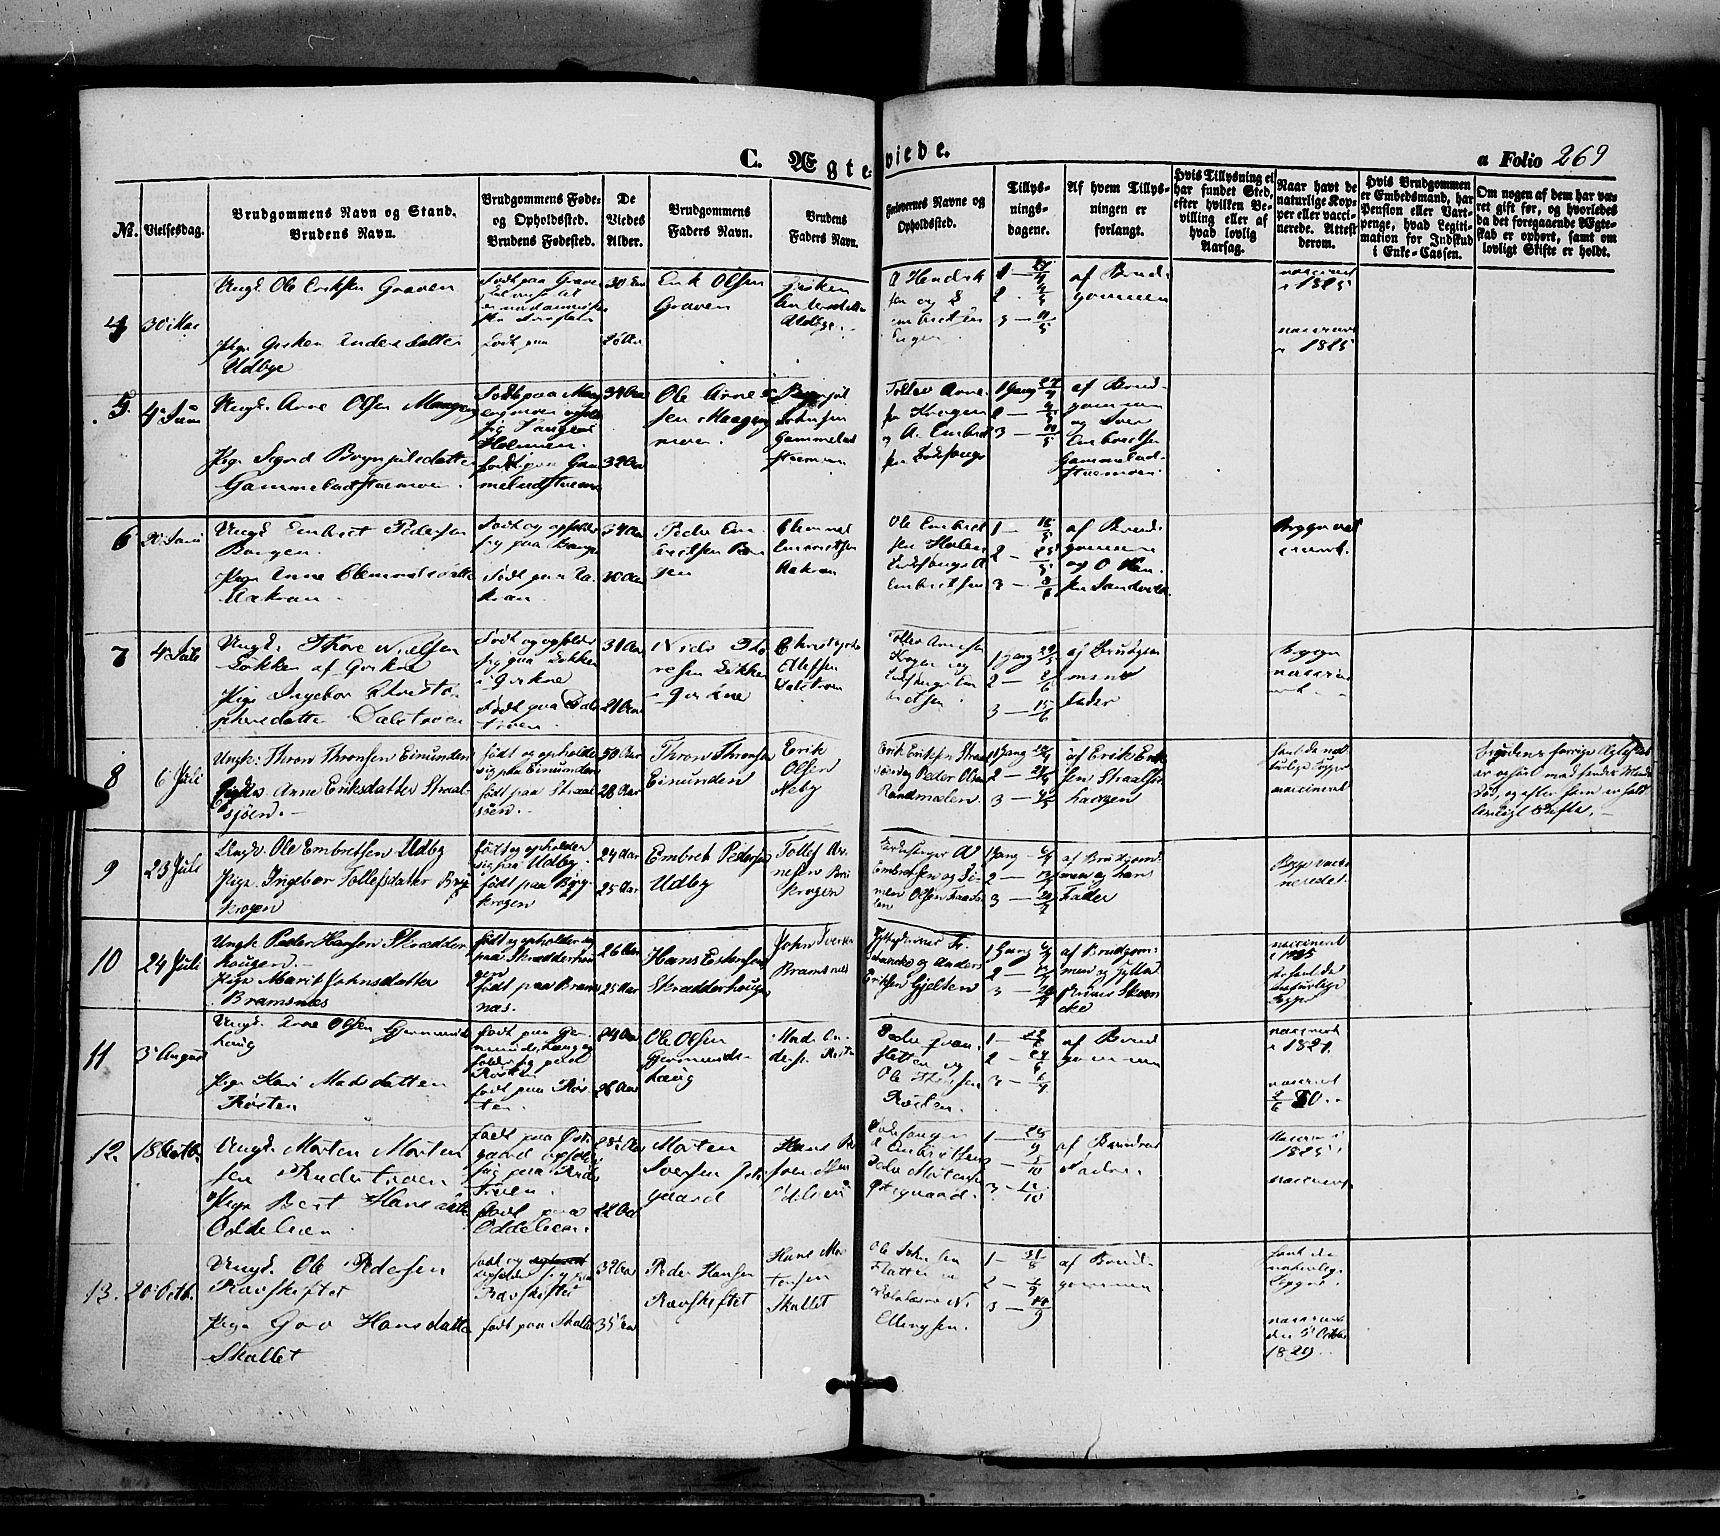 SAH, Tynset prestekontor, Ministerialbok nr. 20, 1848-1862, s. 269